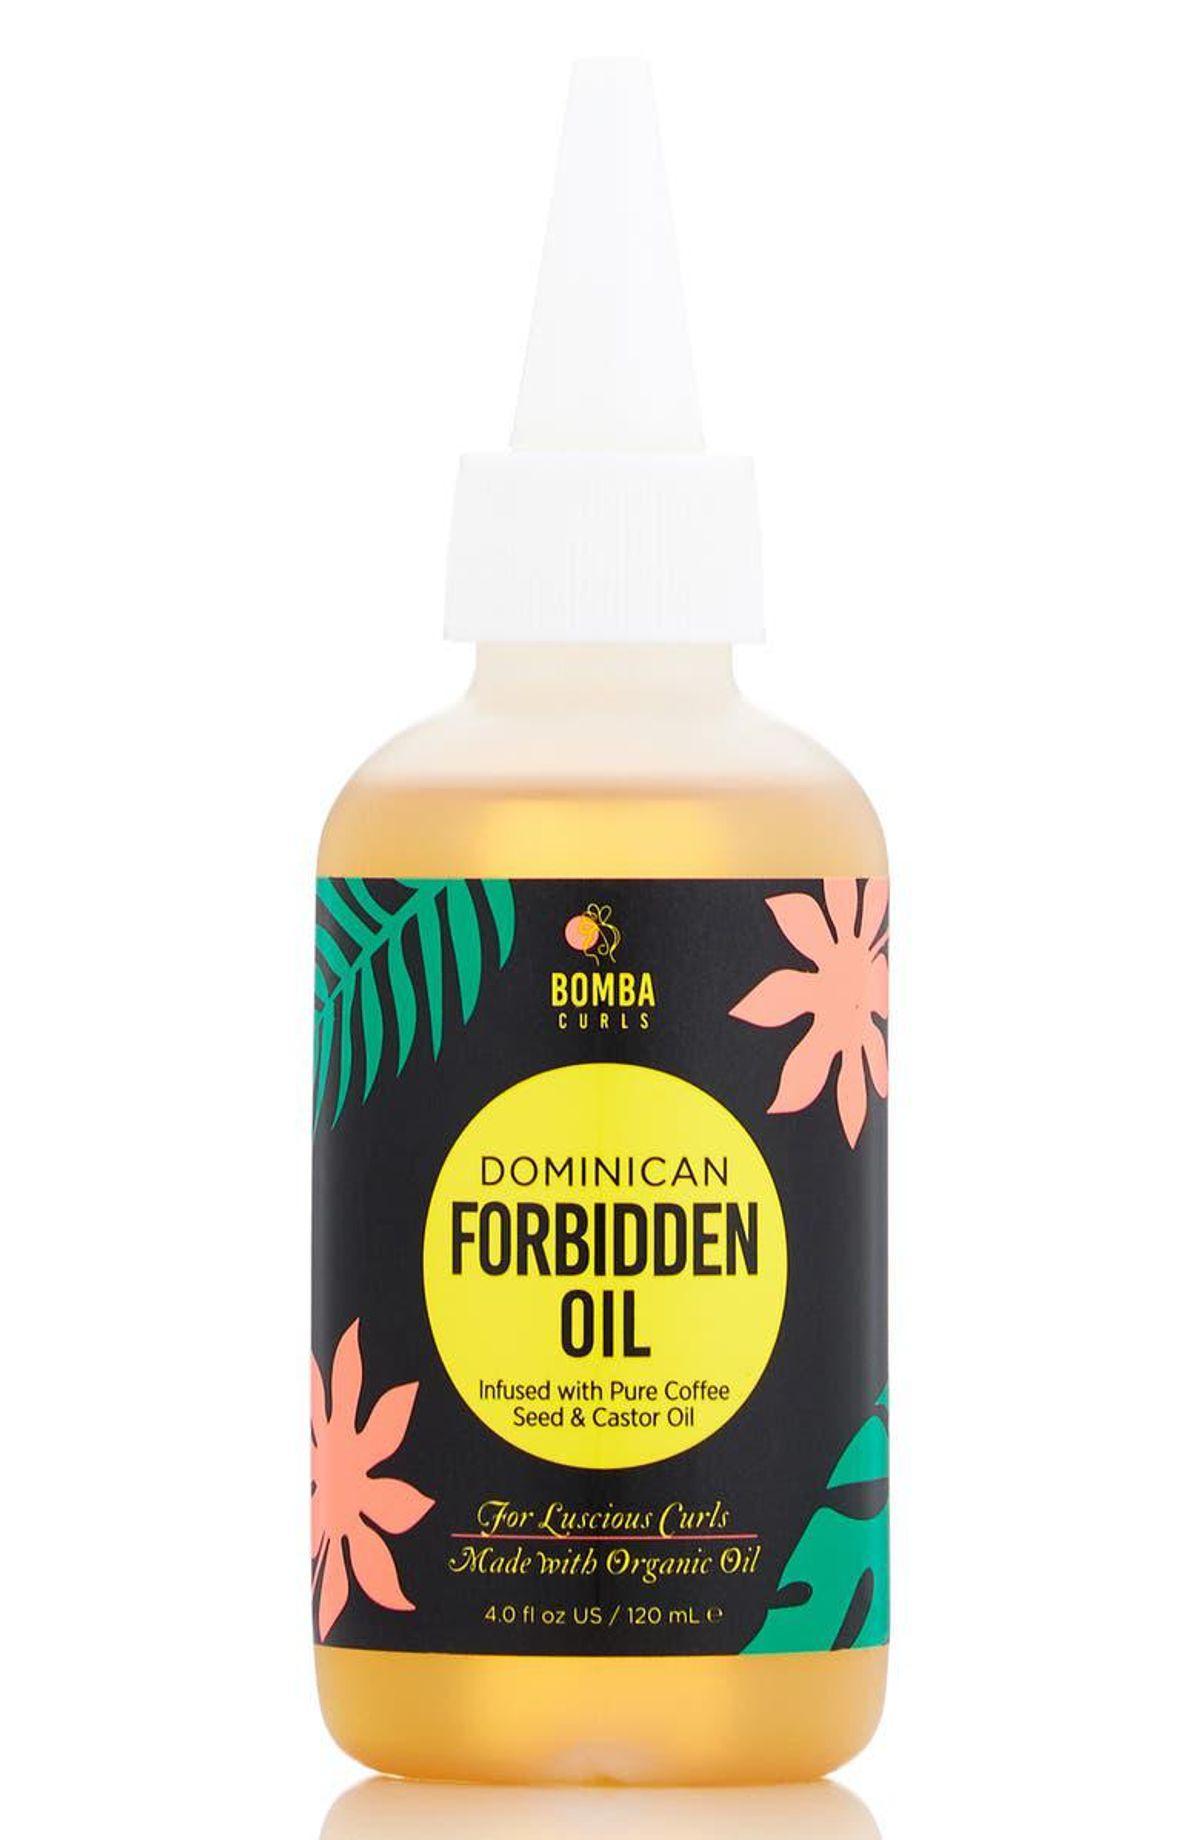 Dominican Forbidden Oil